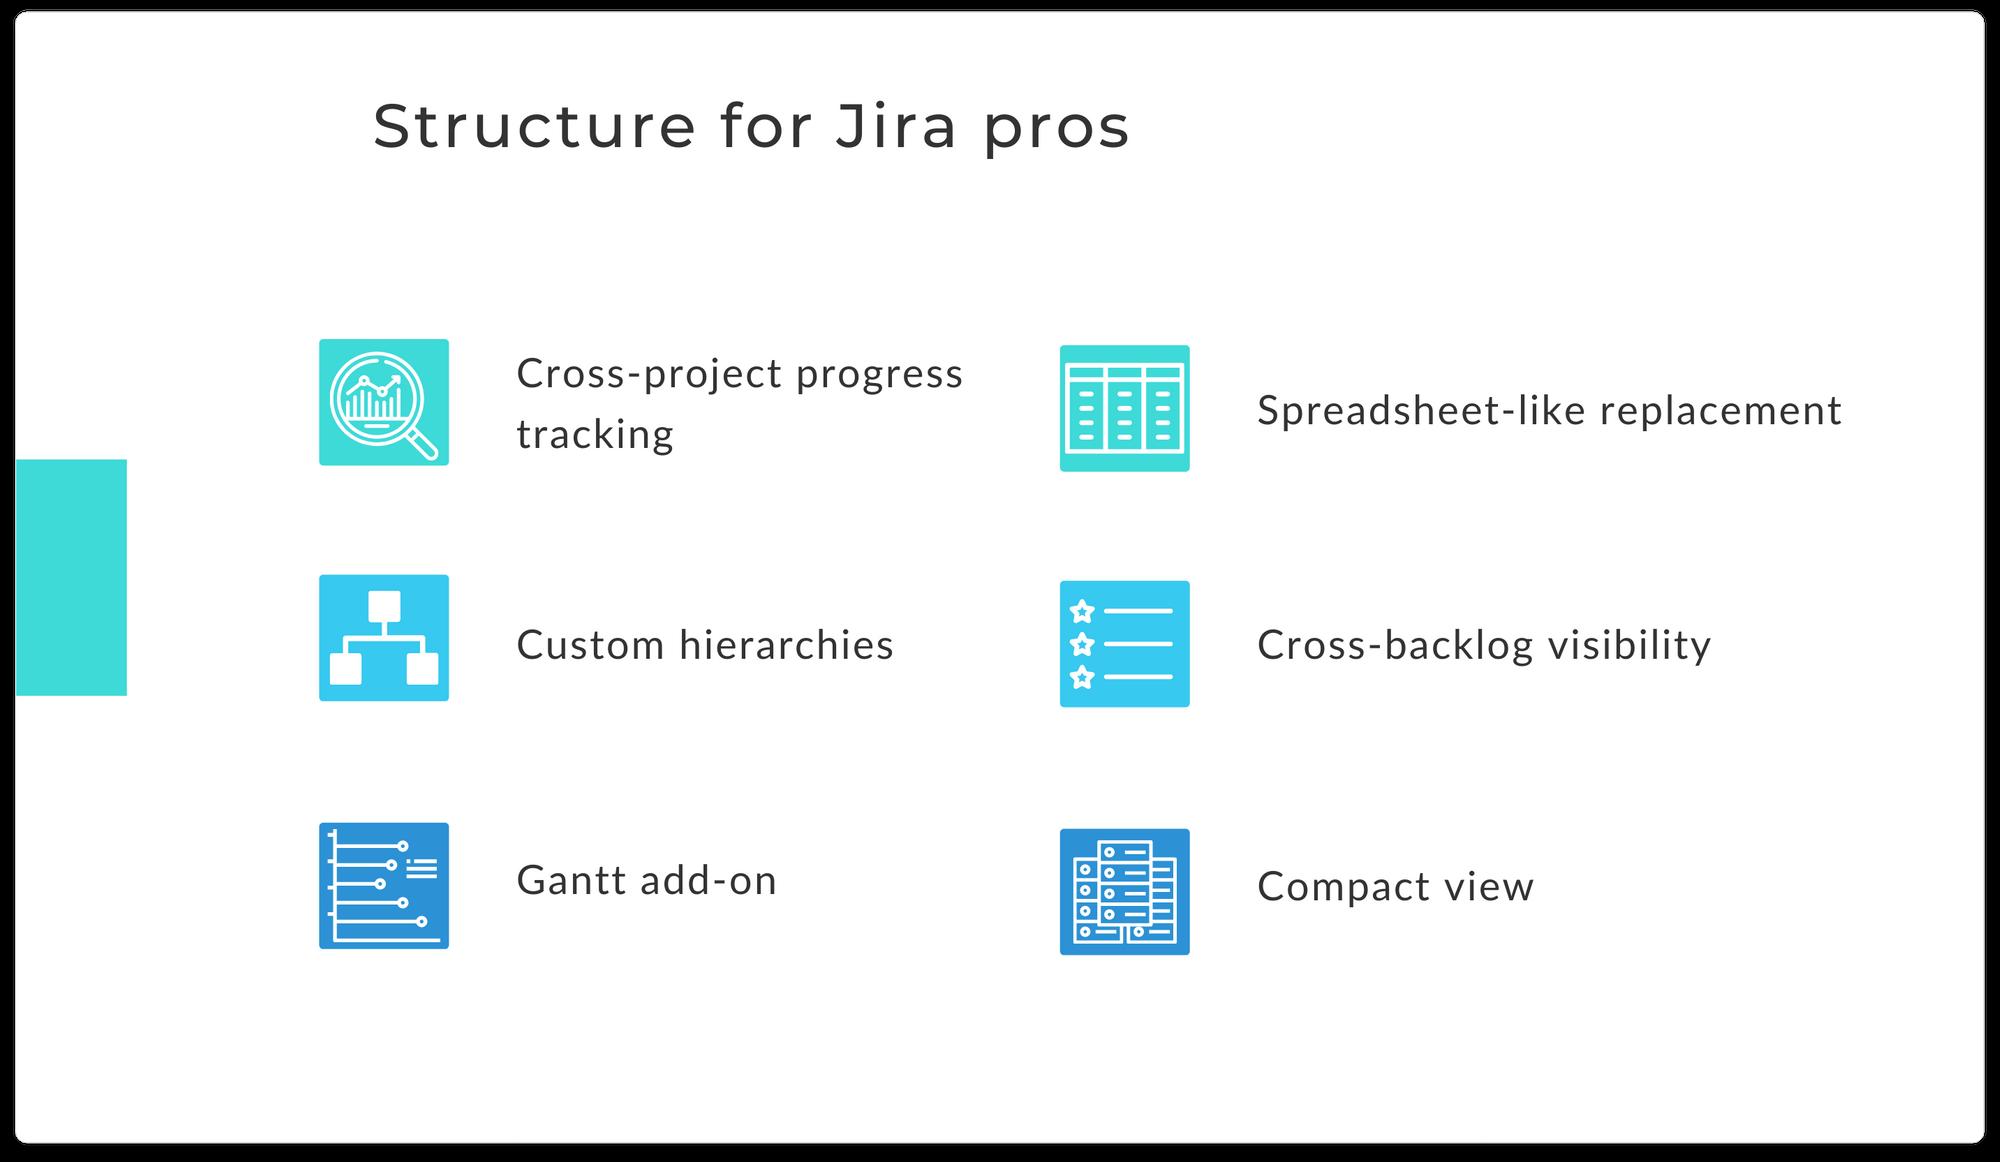 Pros for using Structure.Gantt for Jira